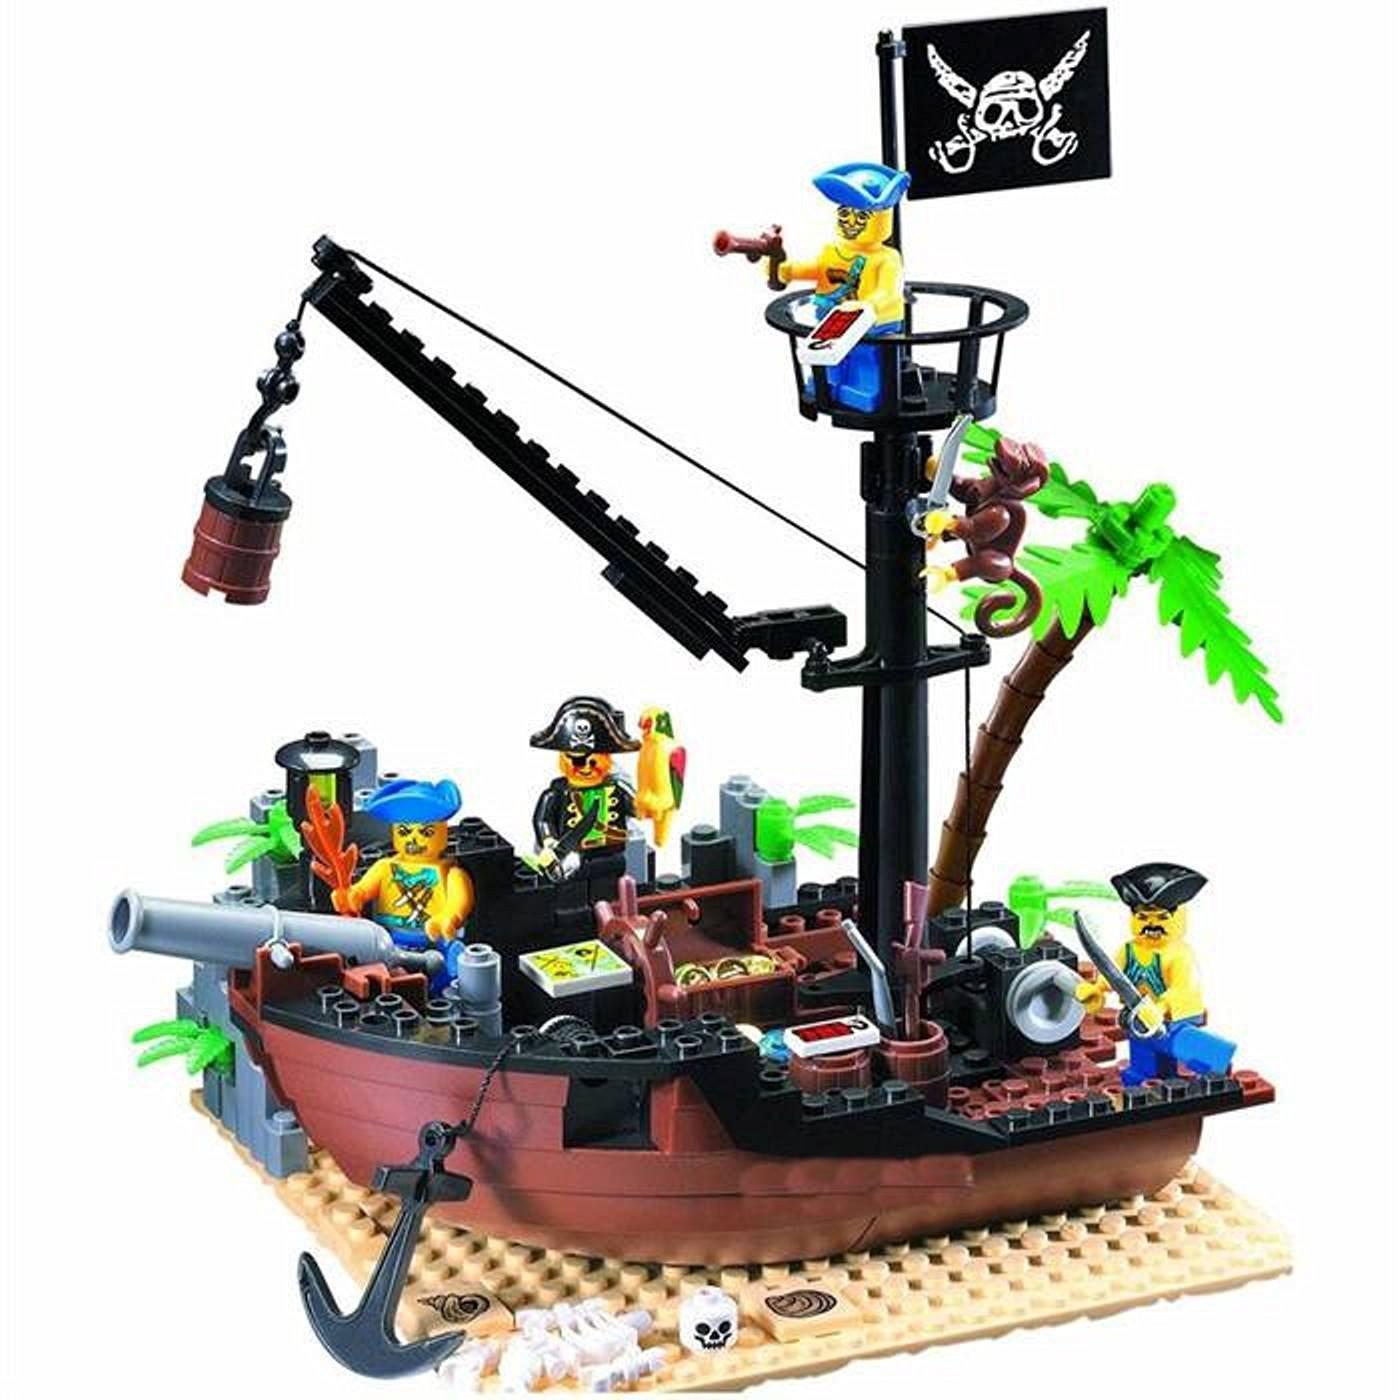 Cheap Model Ship Blocks, find Model Ship Blocks deals on line at